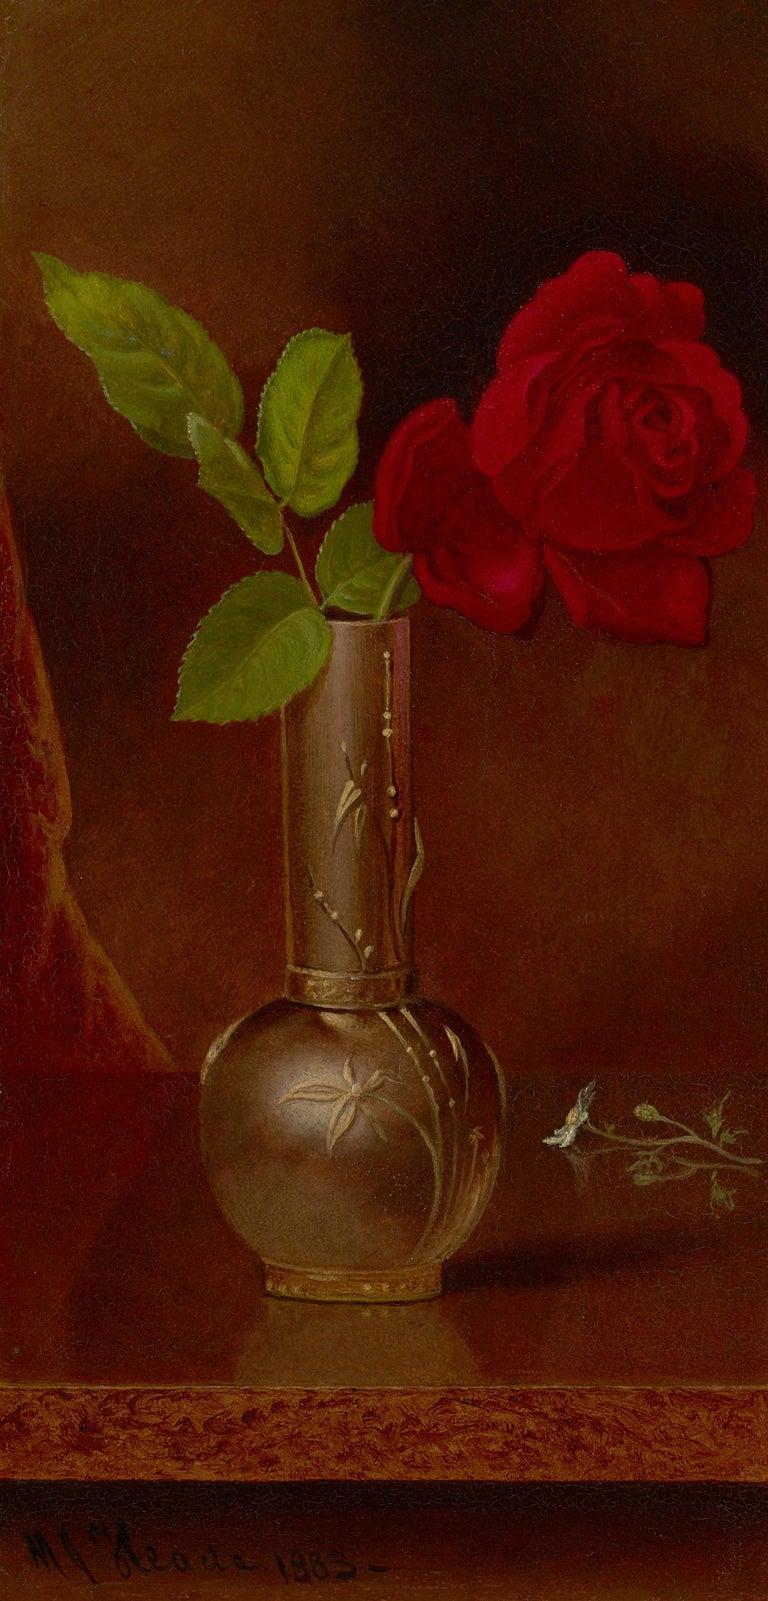 Martin Johnson Heade Still-Life Painting - Red Rose in a Standing Vase